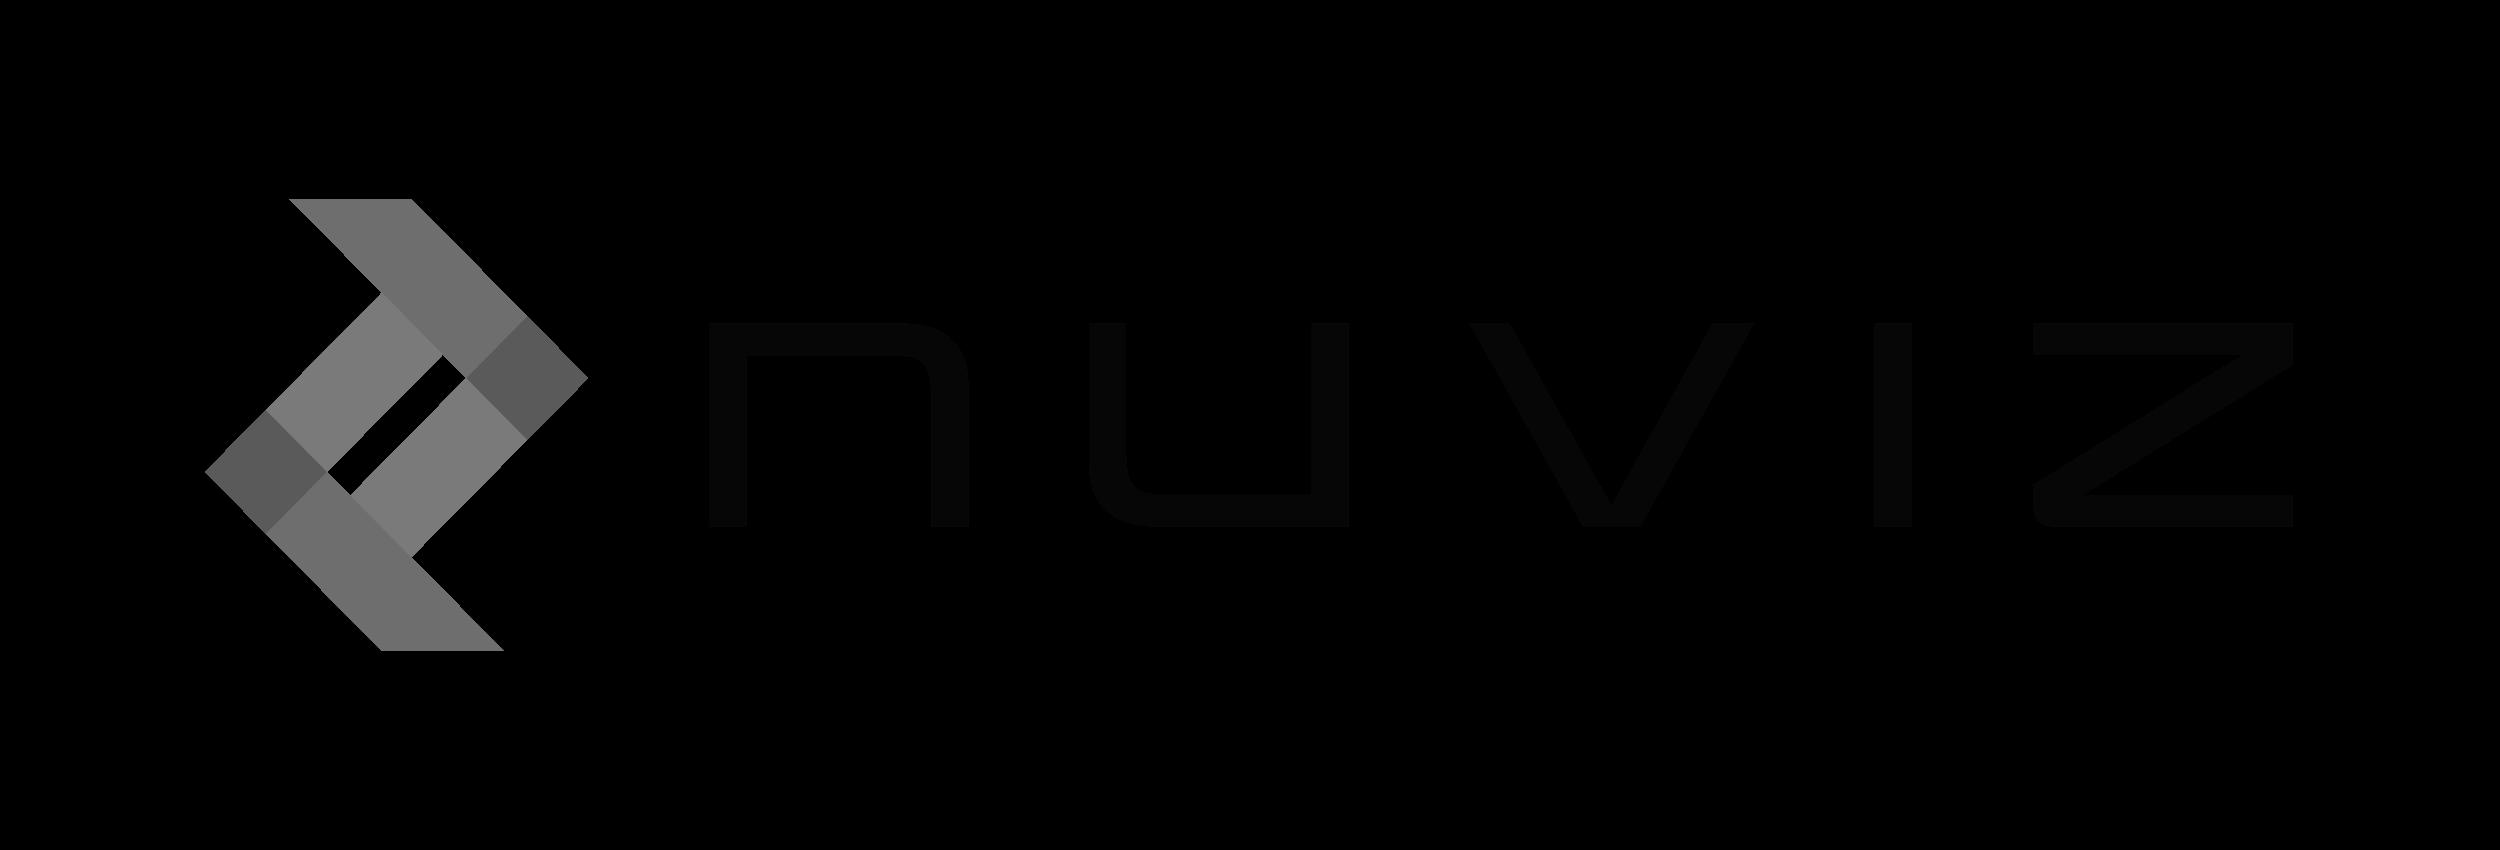 ride-nuviz-logo